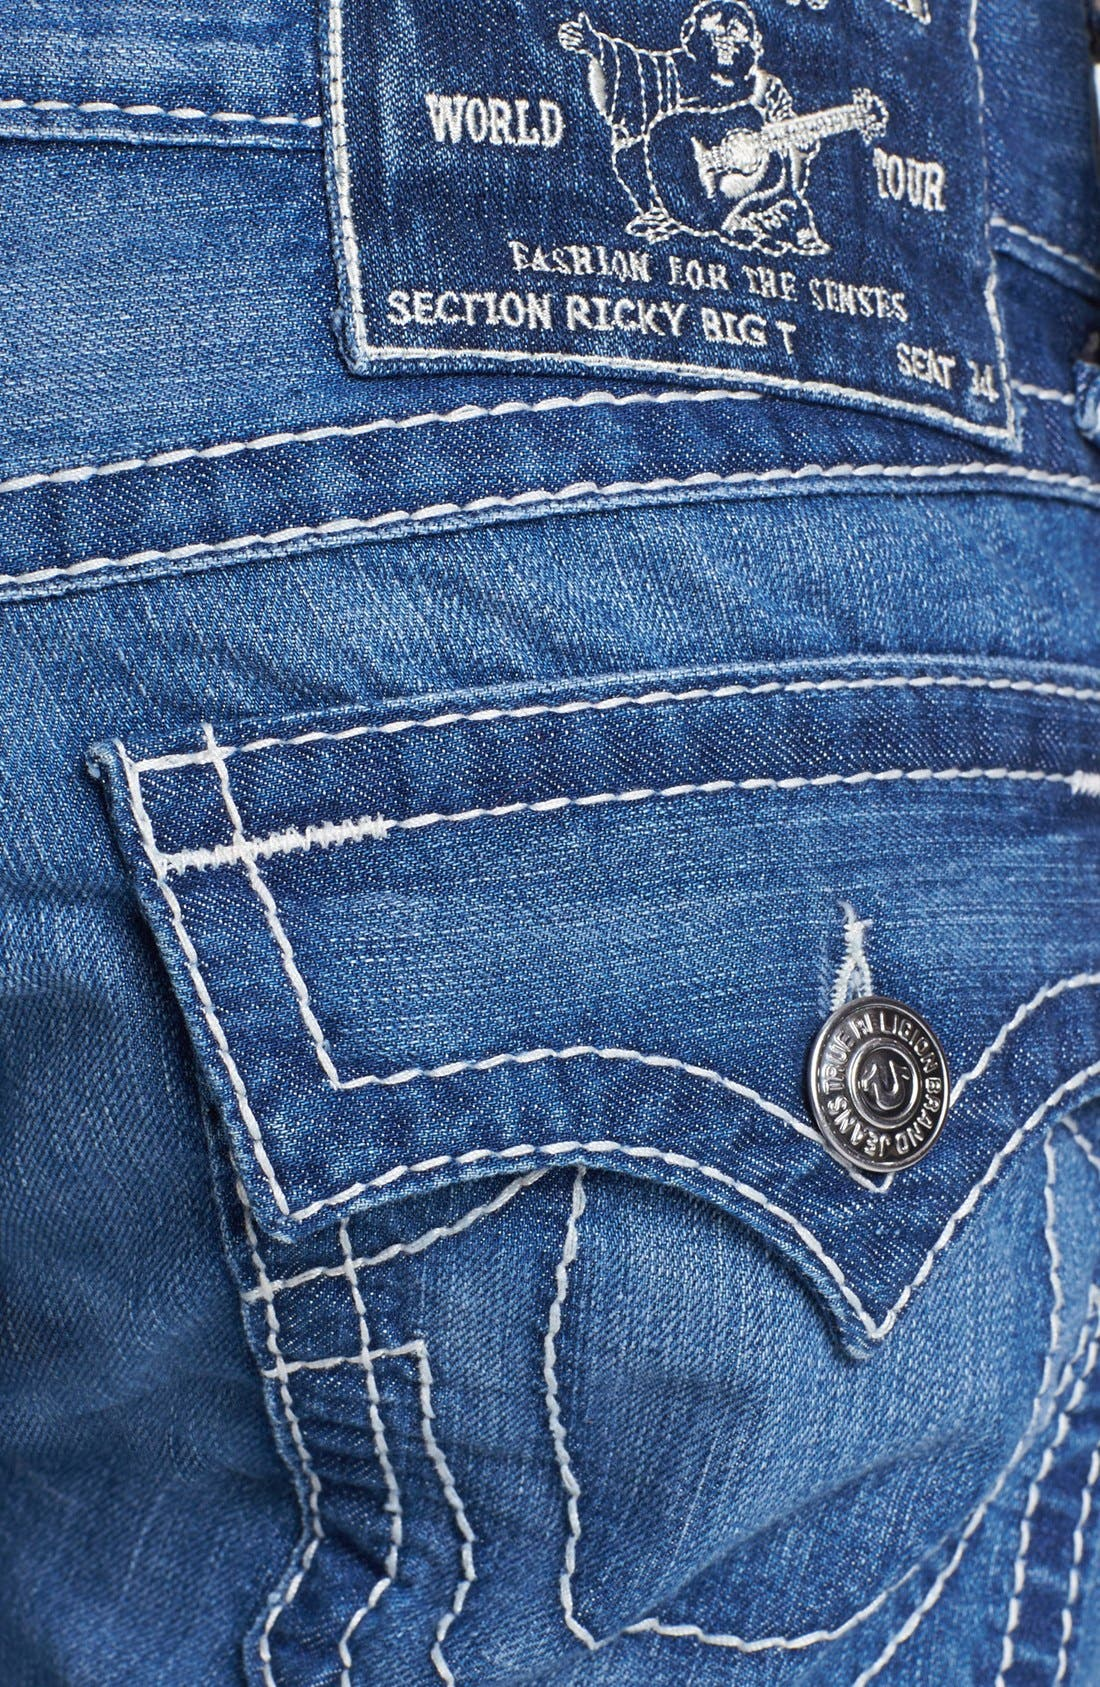 Alternate Image 4  - True Religion Brand Jeans 'Ricky' Straight Leg Jeans (Voyager)